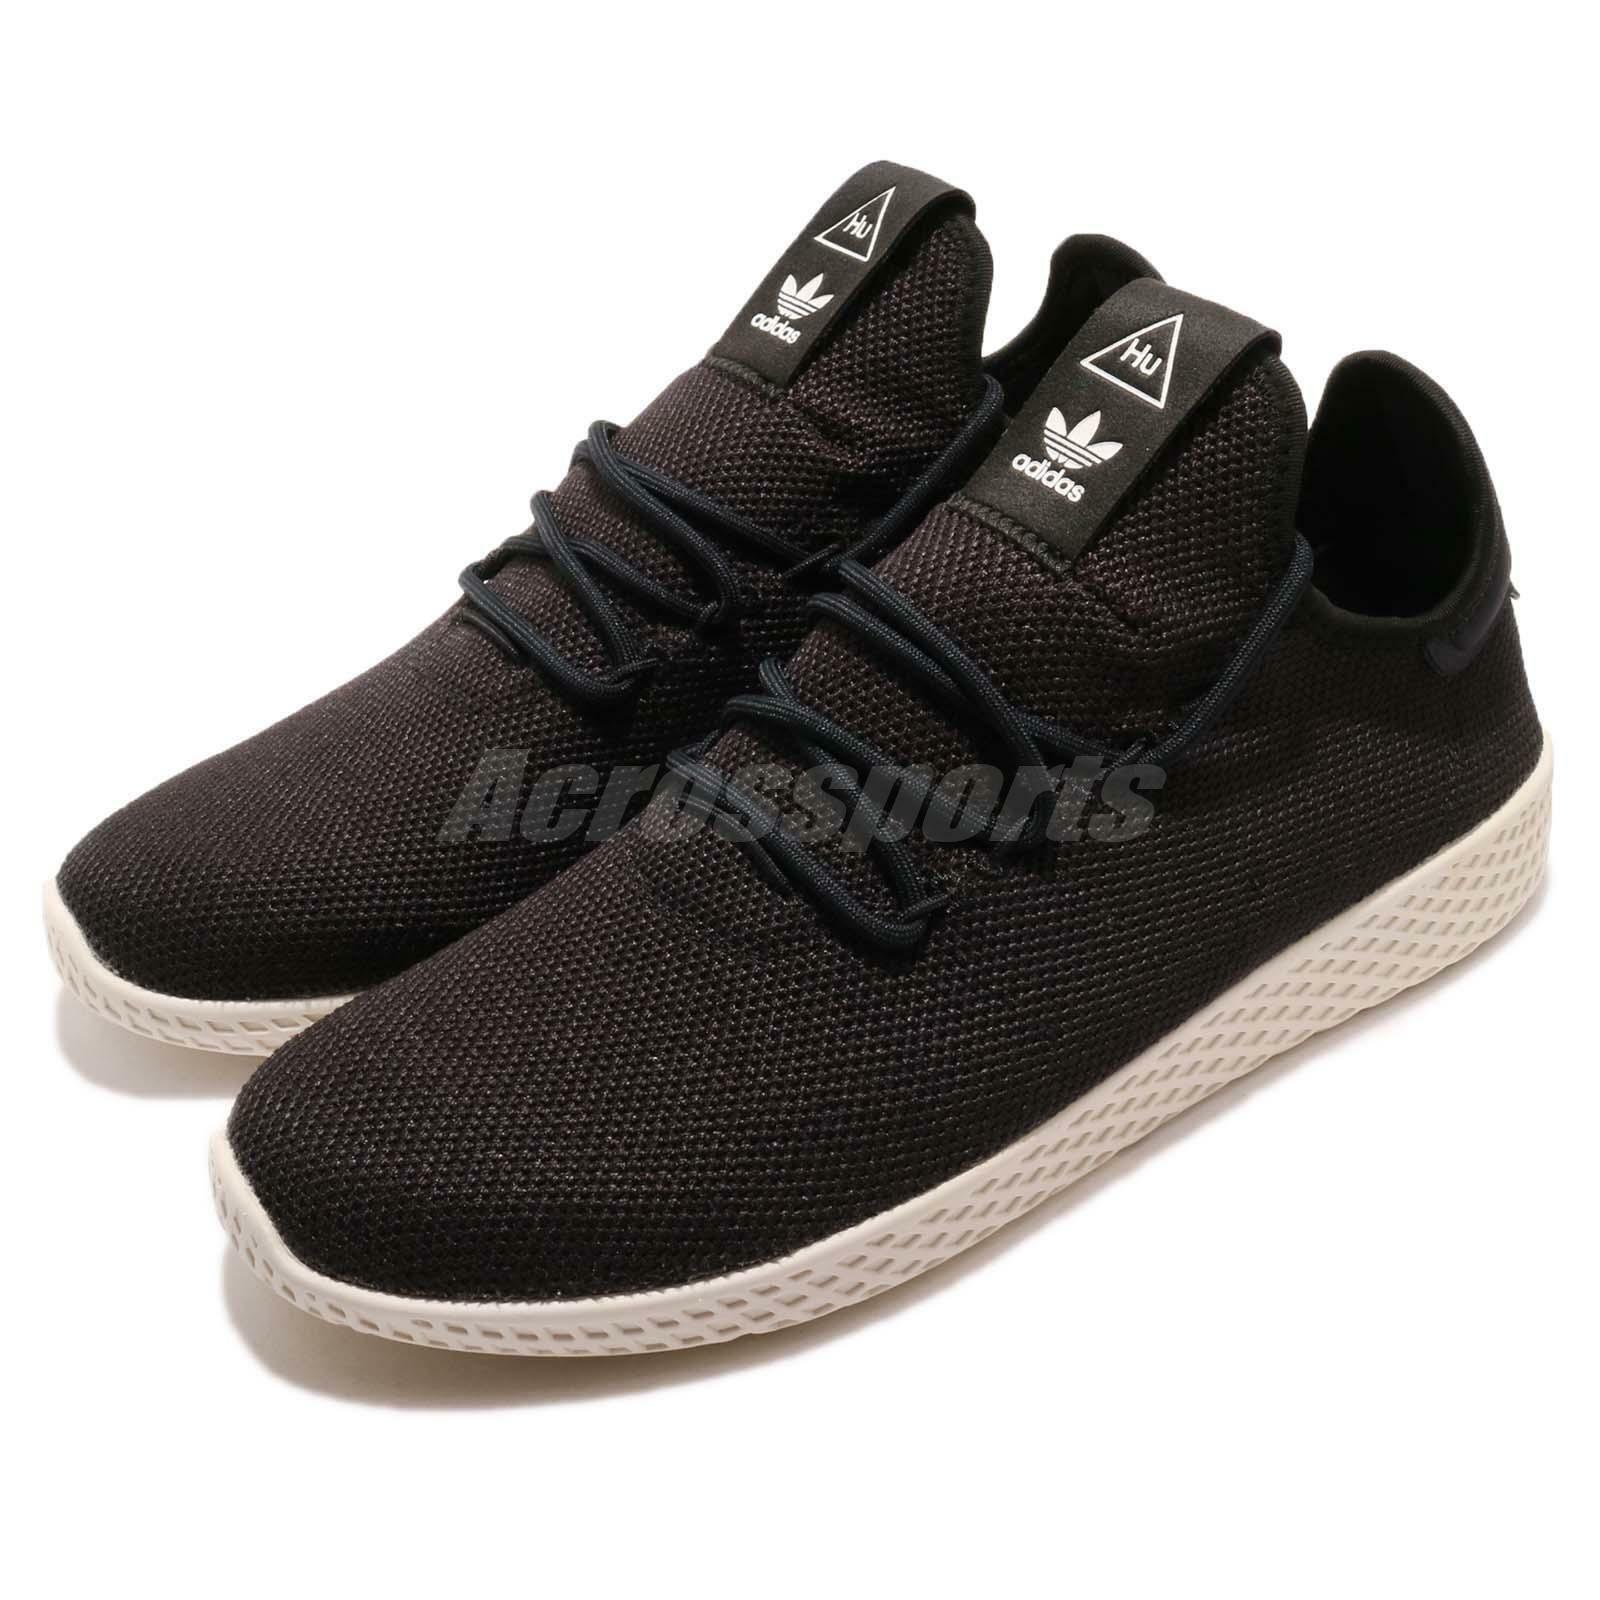 adidas Originals Pharrell PW Tennis Hu Pharrell Originals Williams Negro Blanco Hombre Zapatos  AQ20186 40c40c